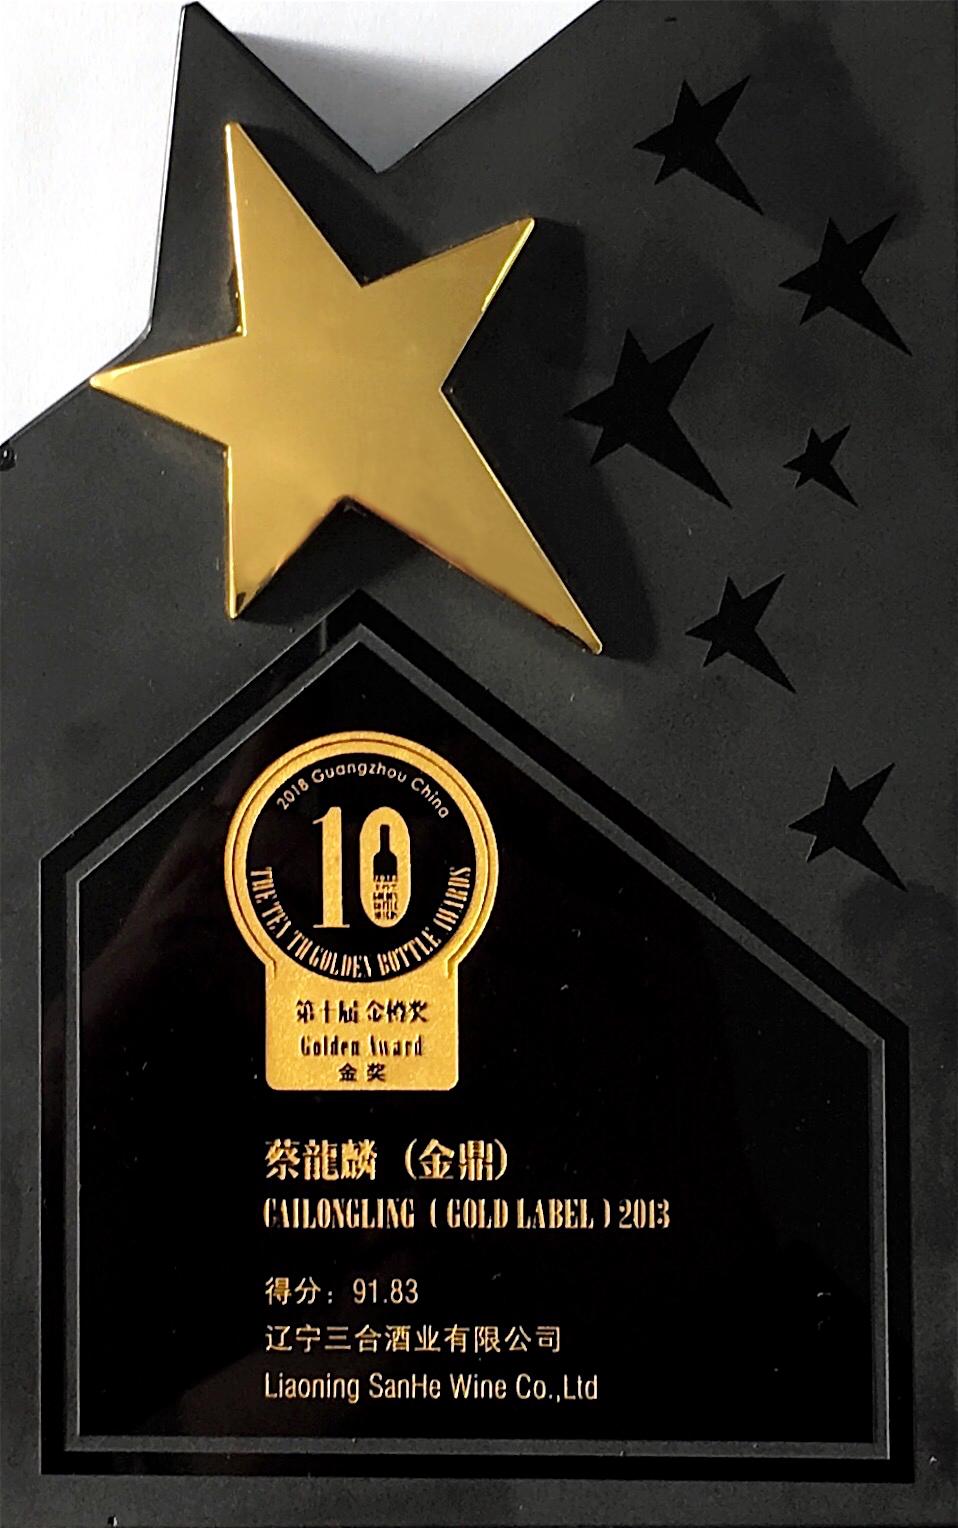 <span><span>第十届金樽奖金奖(金鼎2013)</span></span>